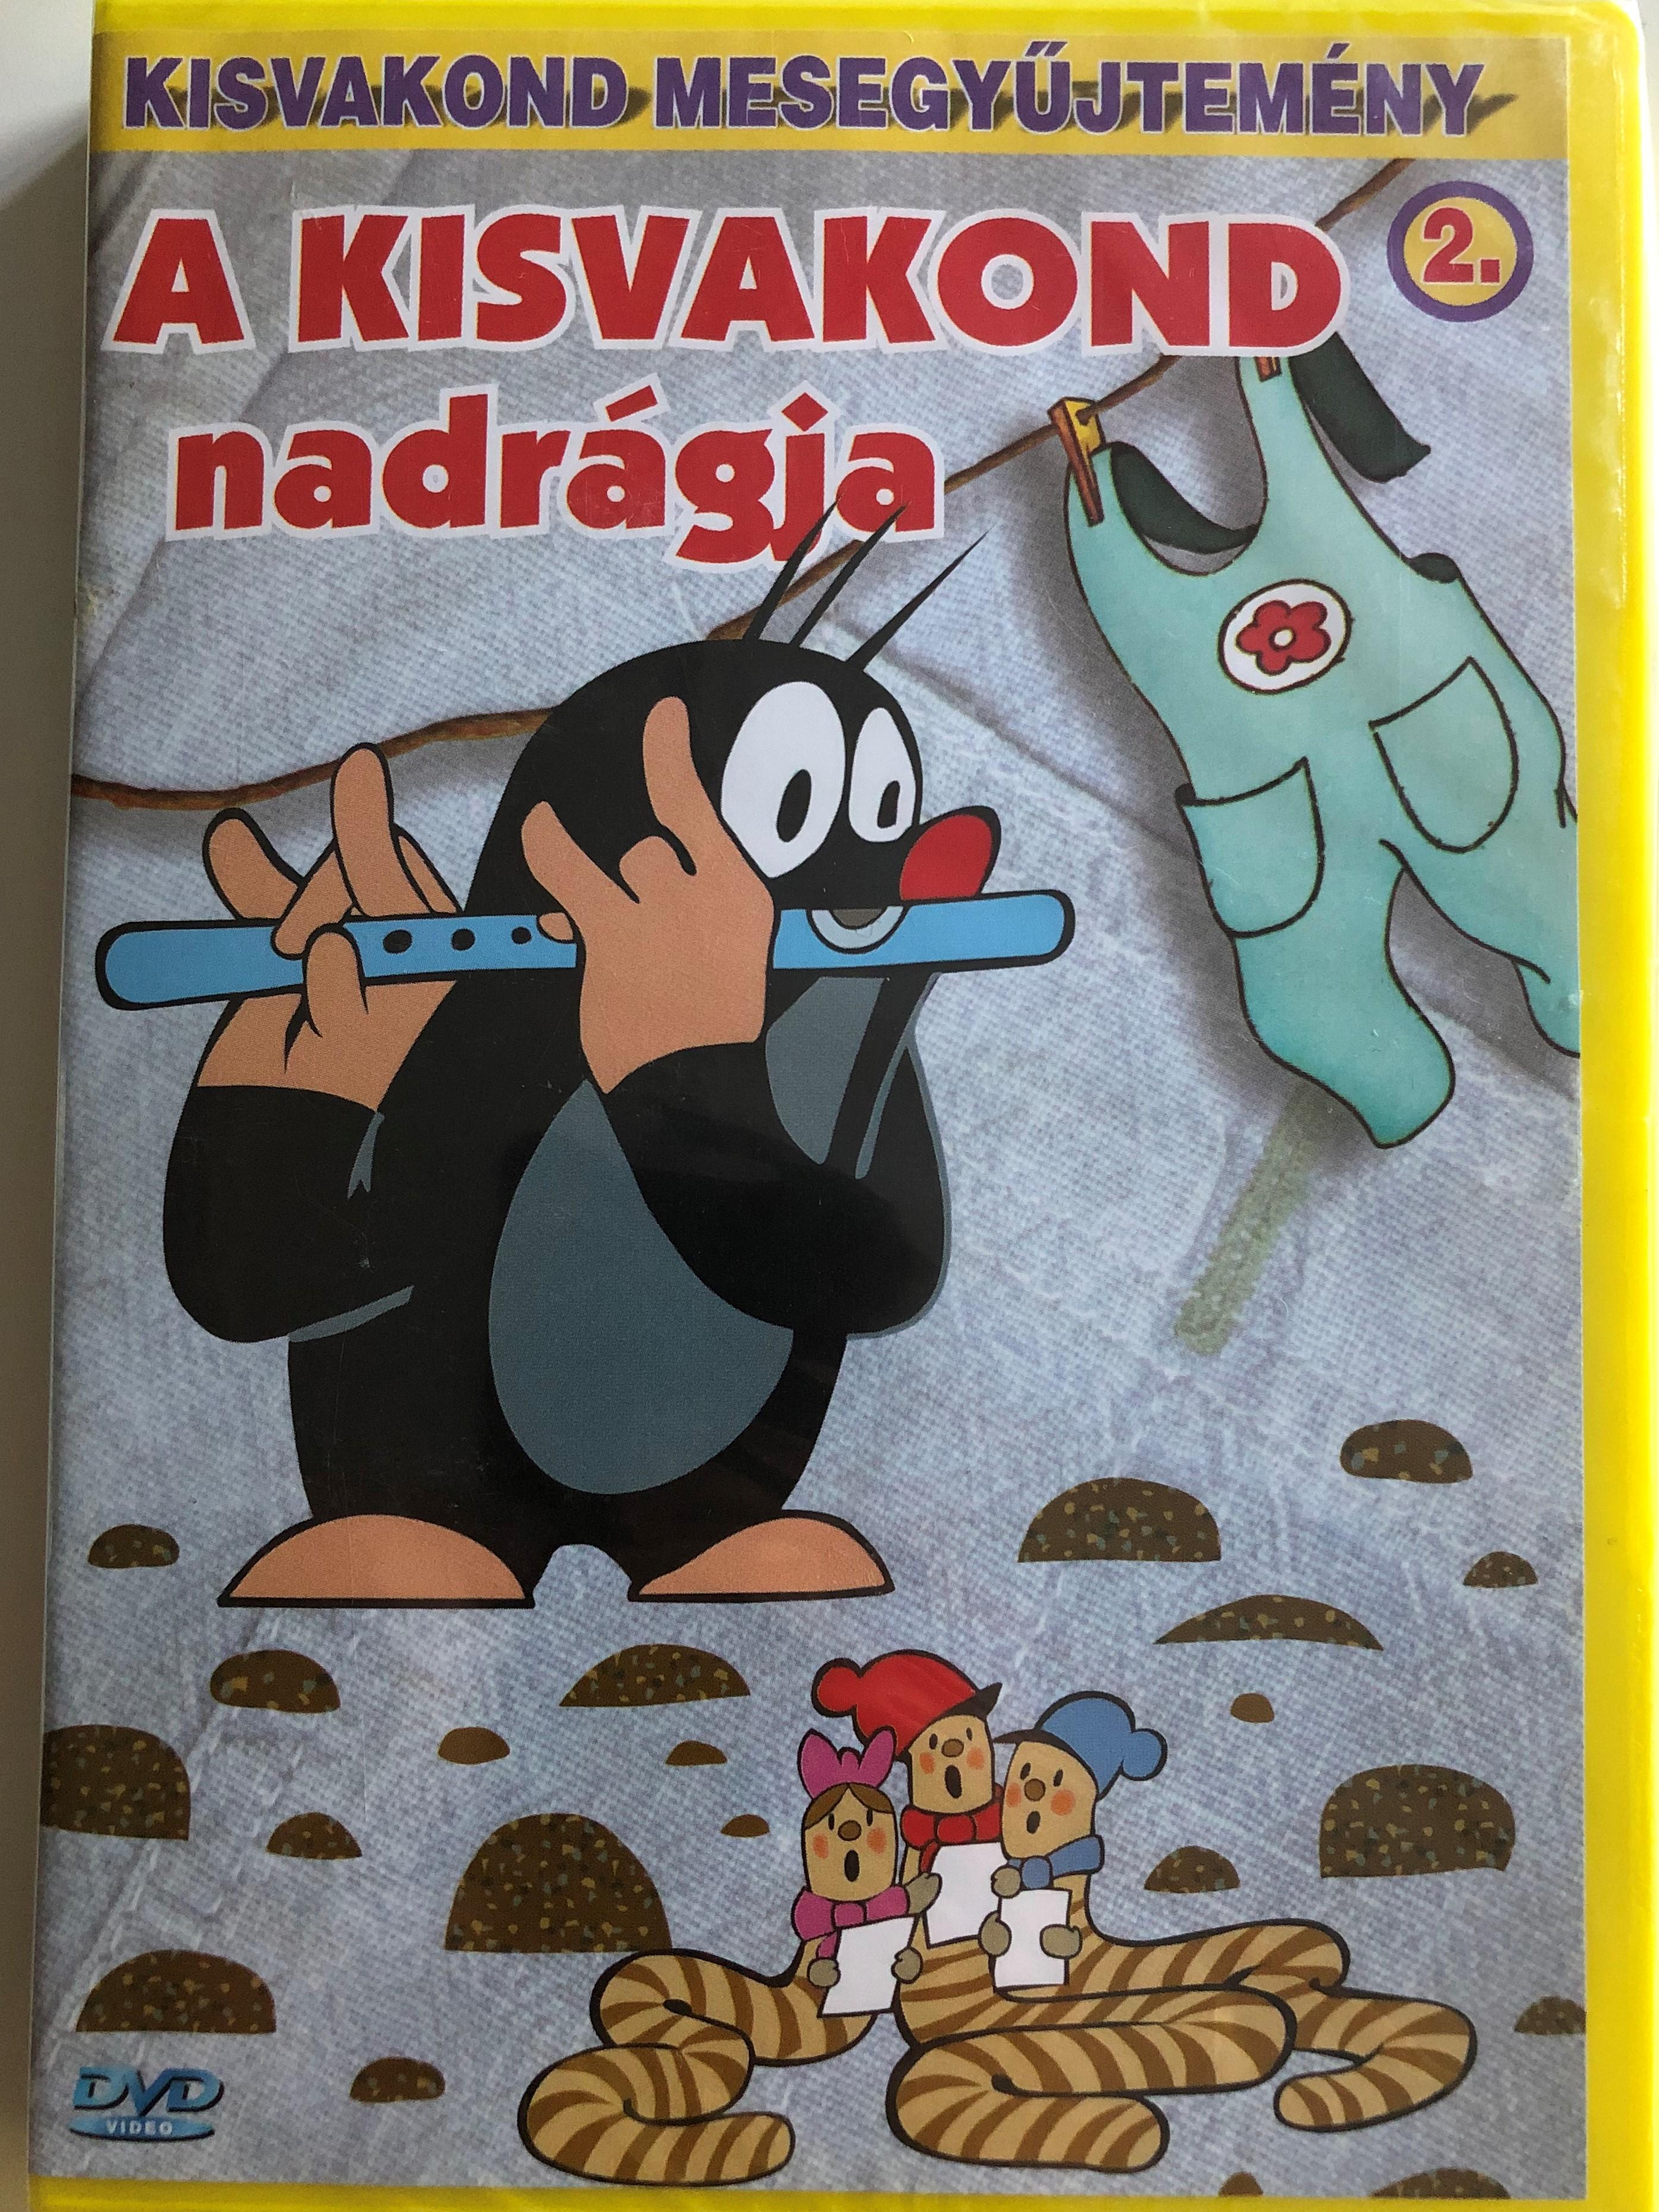 krtek-s-pants-little-mole-series-2.-dvd-2000-a-kisvakond-nadr-gja-kisvakond-mesegy-jtem-ny-2.-8-episodes-on-disc-classic-czech-cartoon-created-by-zden-k-miler-1-.jpg